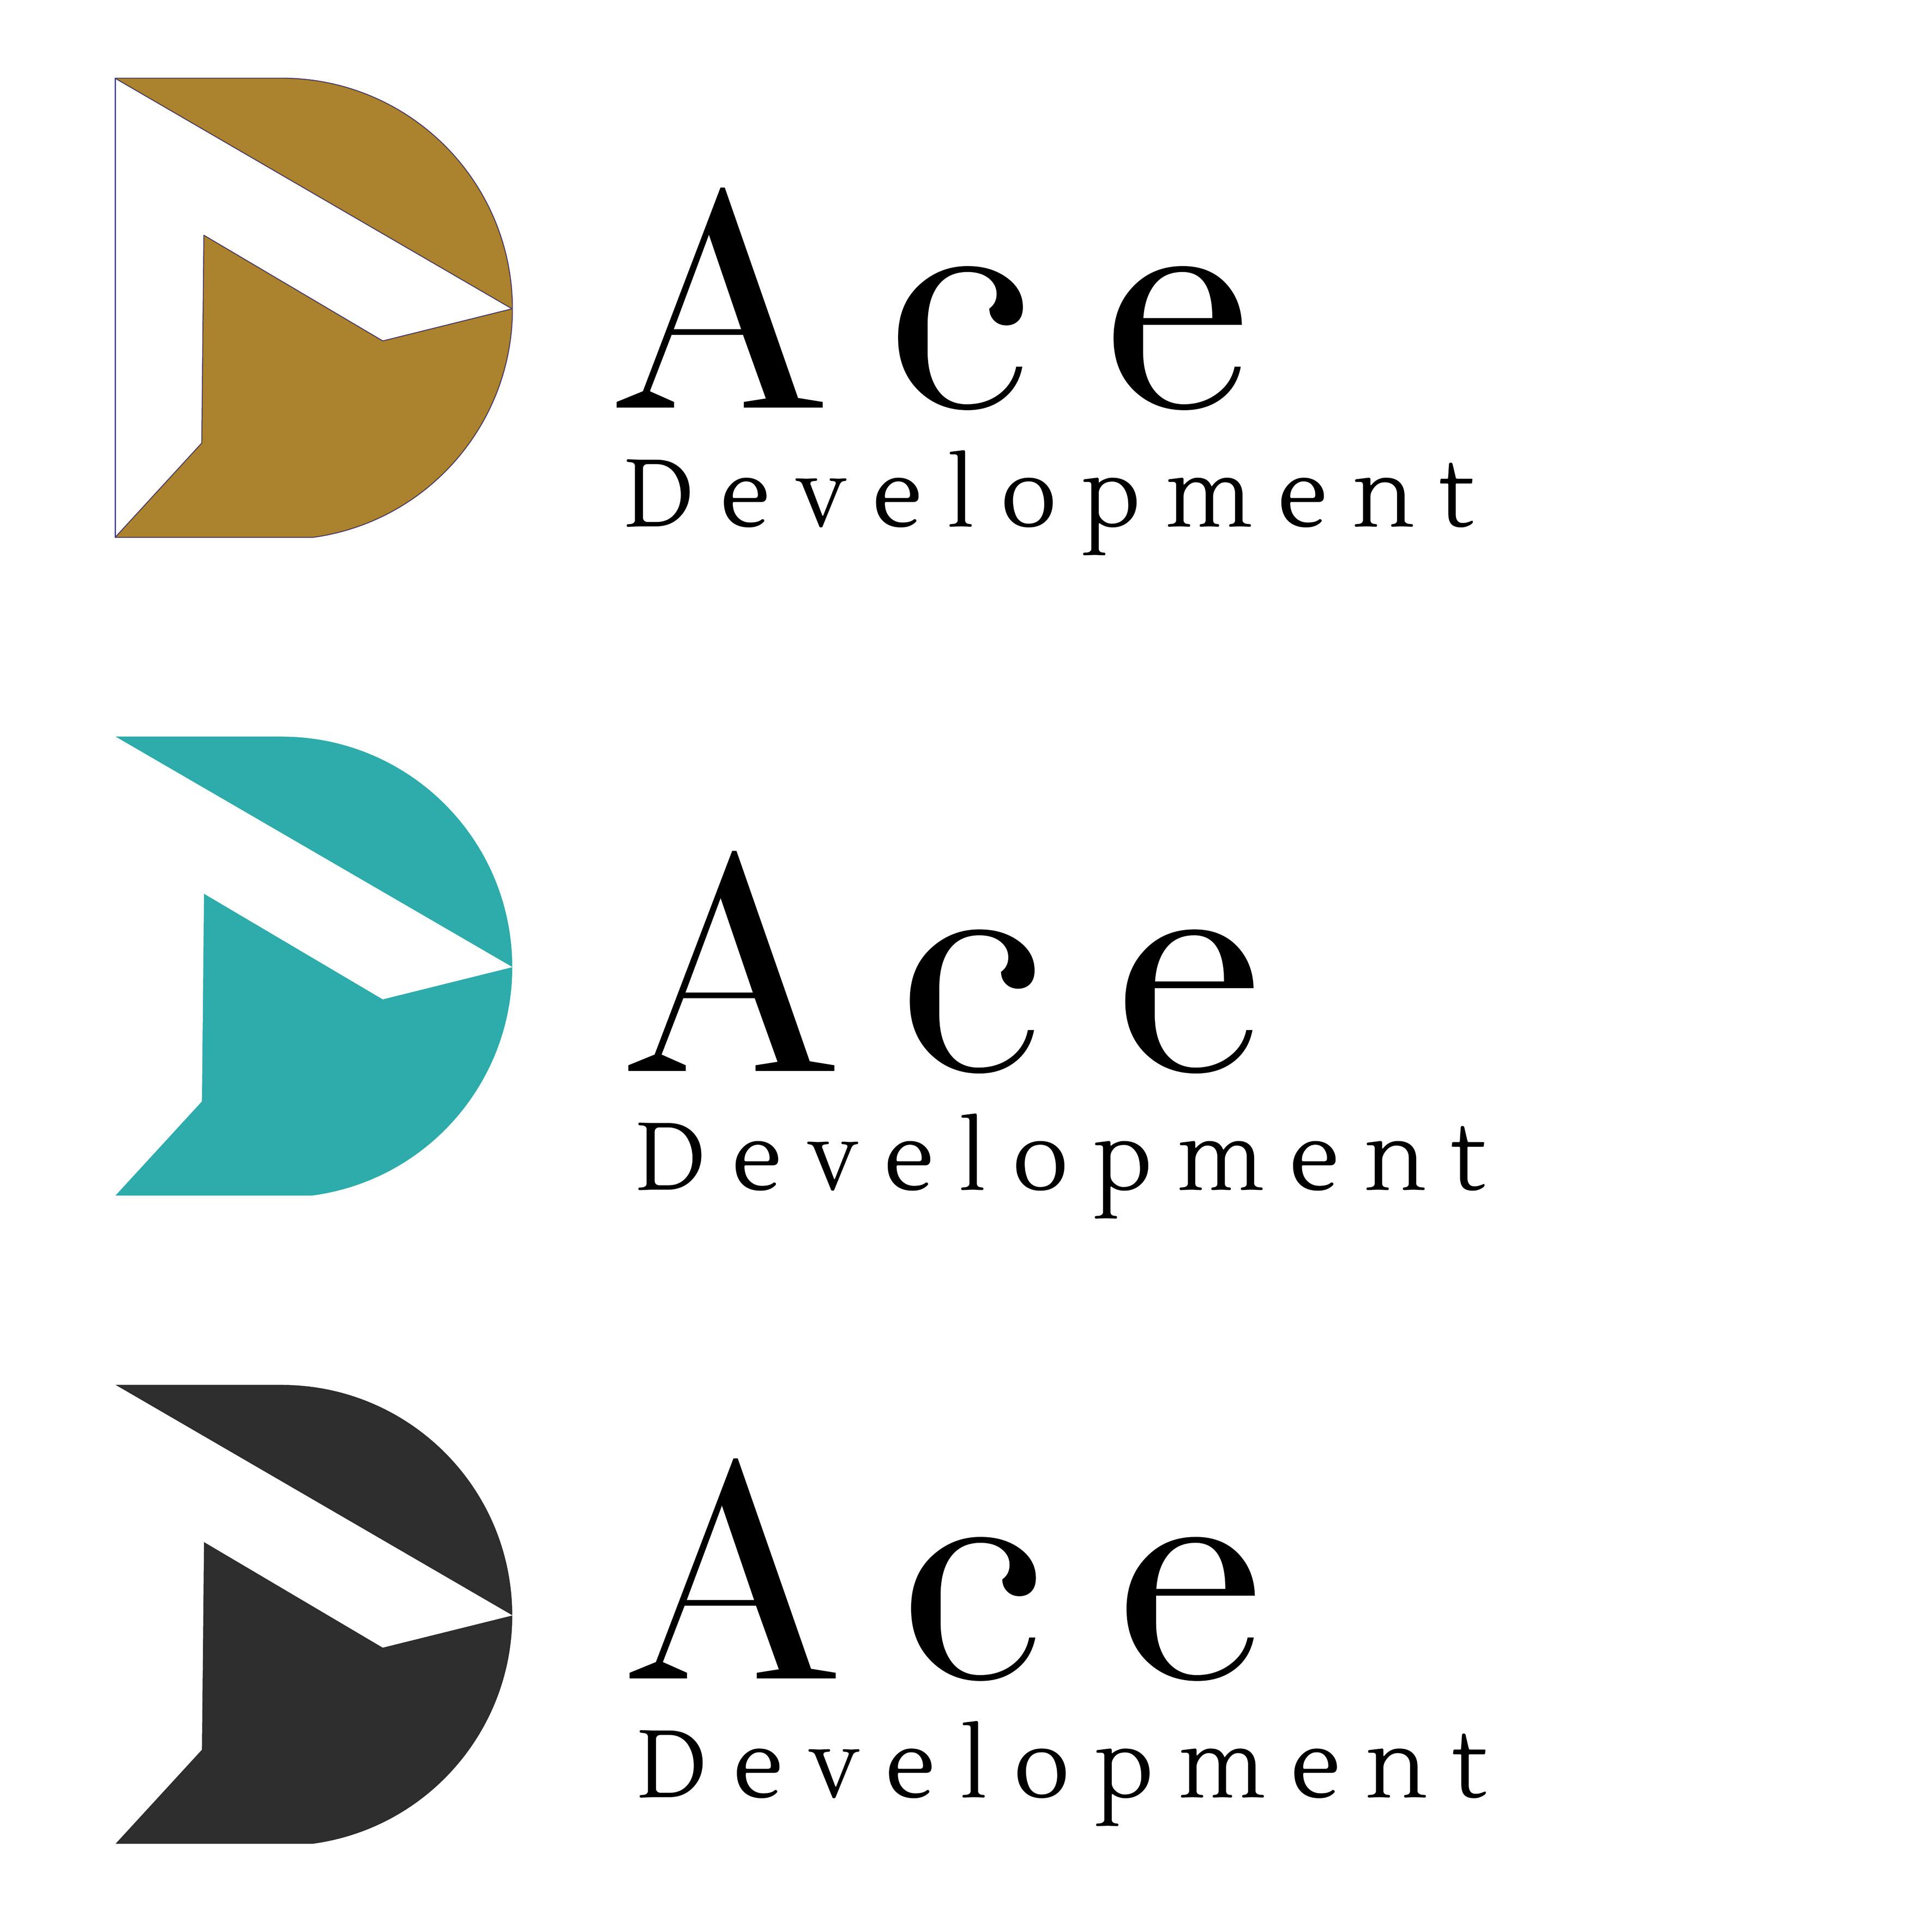 Logo Design by Dn.ArtAndDesign - Entry No. 87 in the Logo Design Contest Fun Logo Design for Ace development.